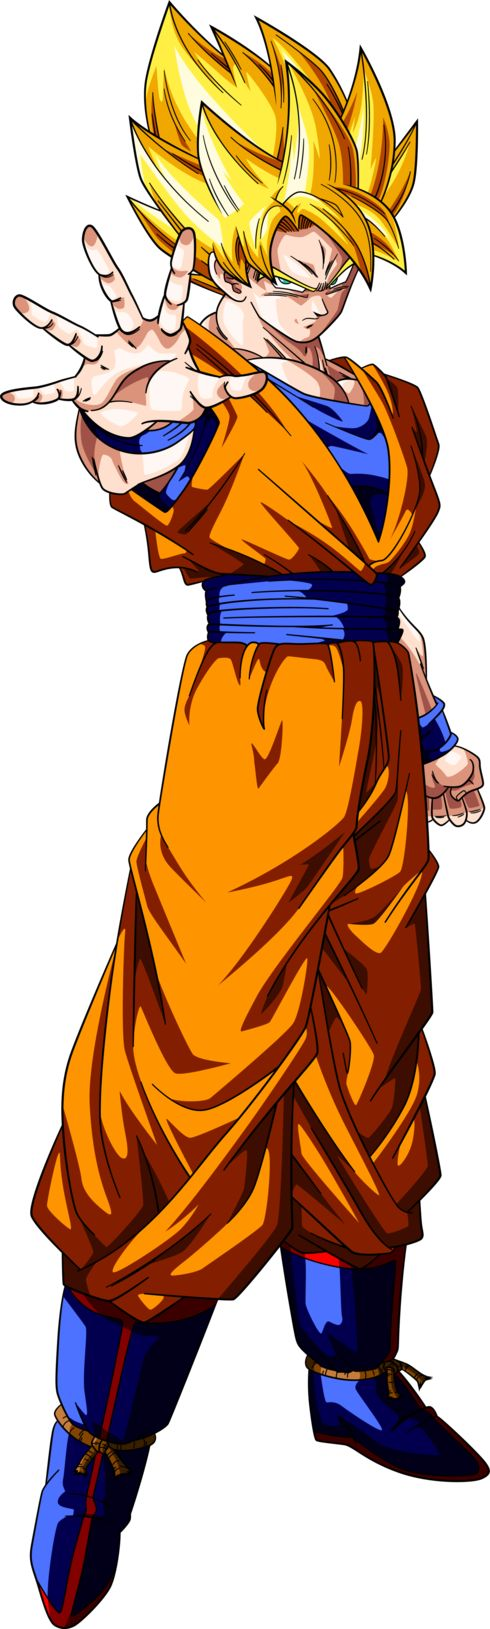 Super Saiyan Goku #2 Alt Palette #2 by RayzorBlade189